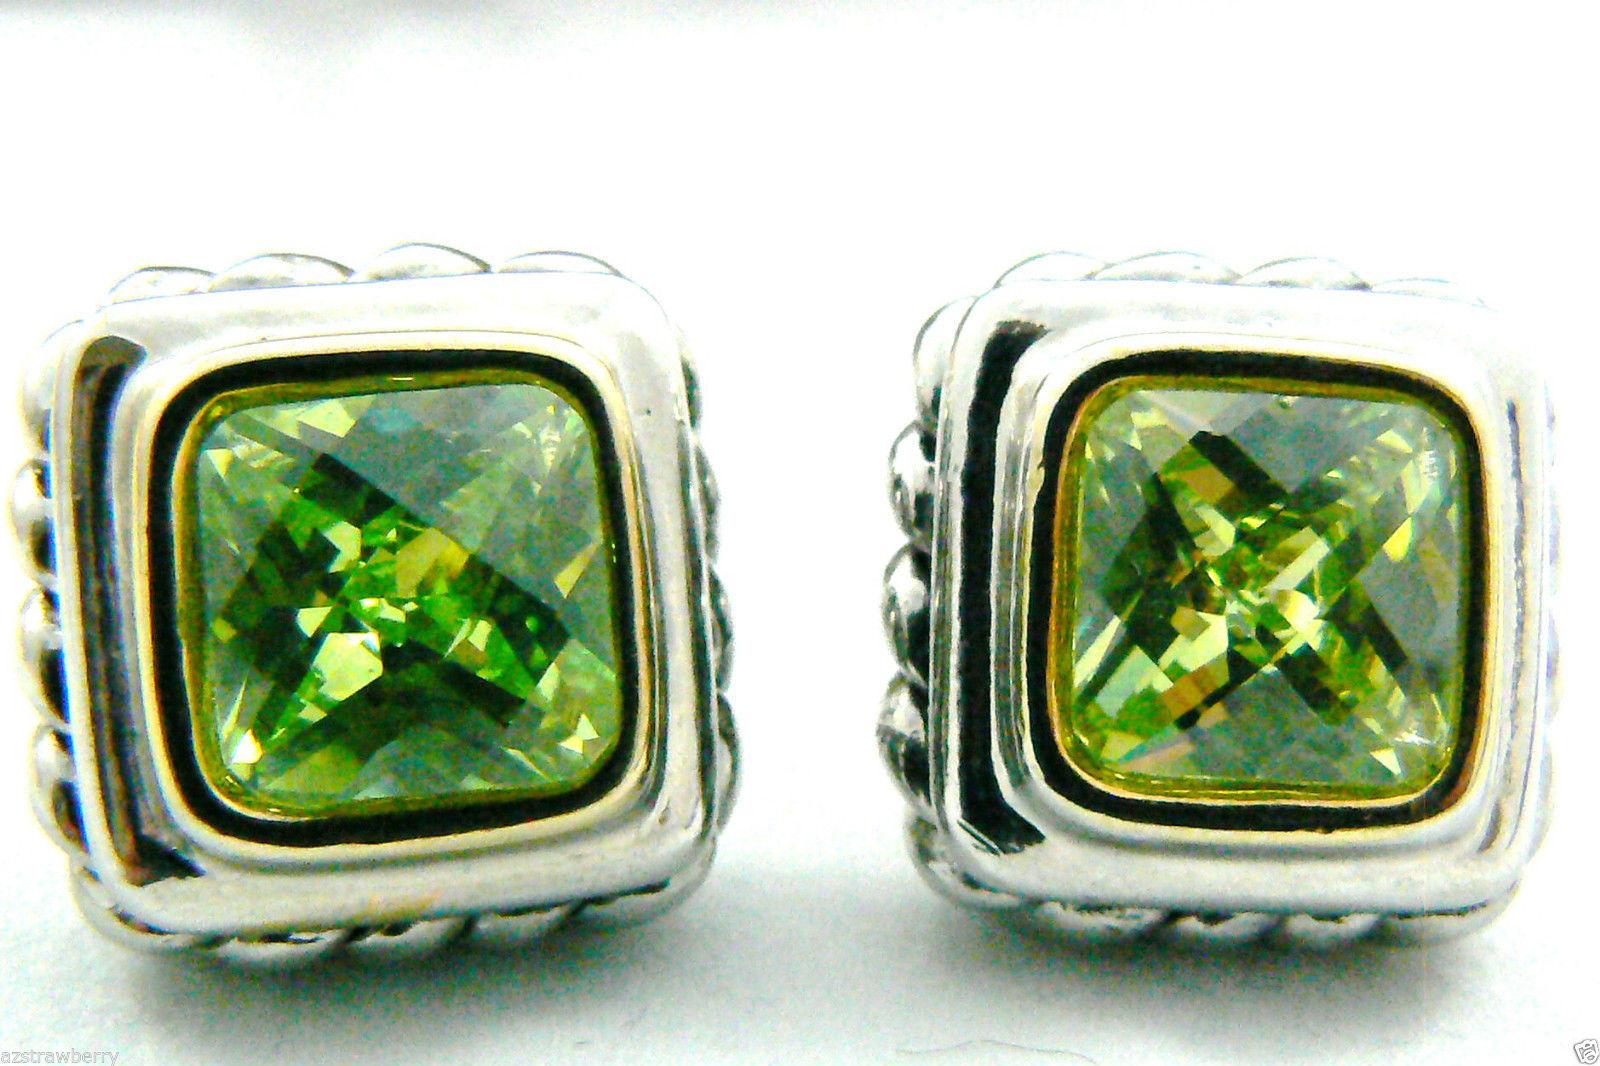 Silver tone Faceted Green Peridot CZ Cubic Zirconia stud earrings $0 sh new